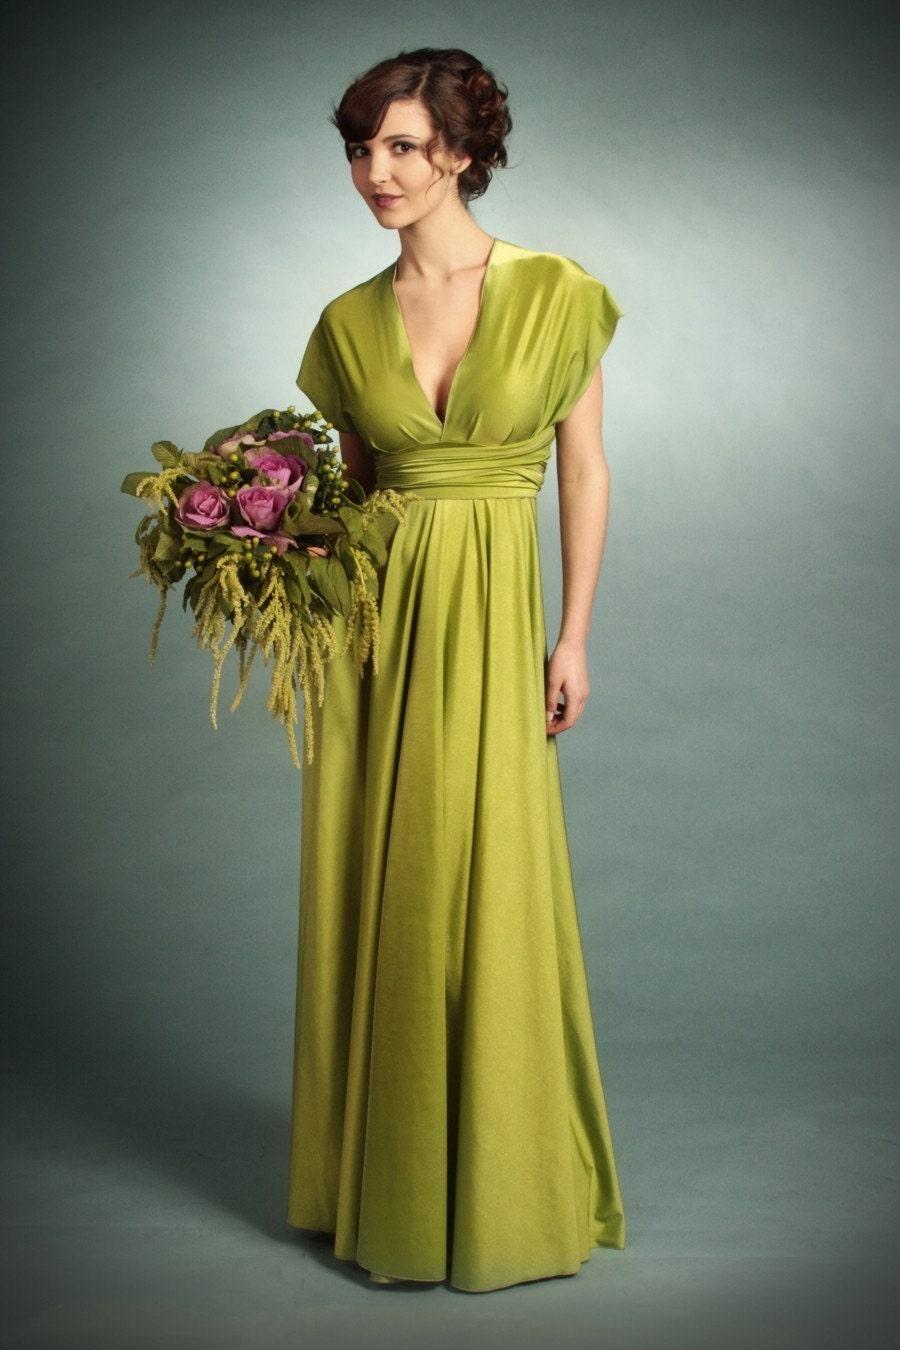 Where Else To Buy Anthropologie Style Dresses Curltalk